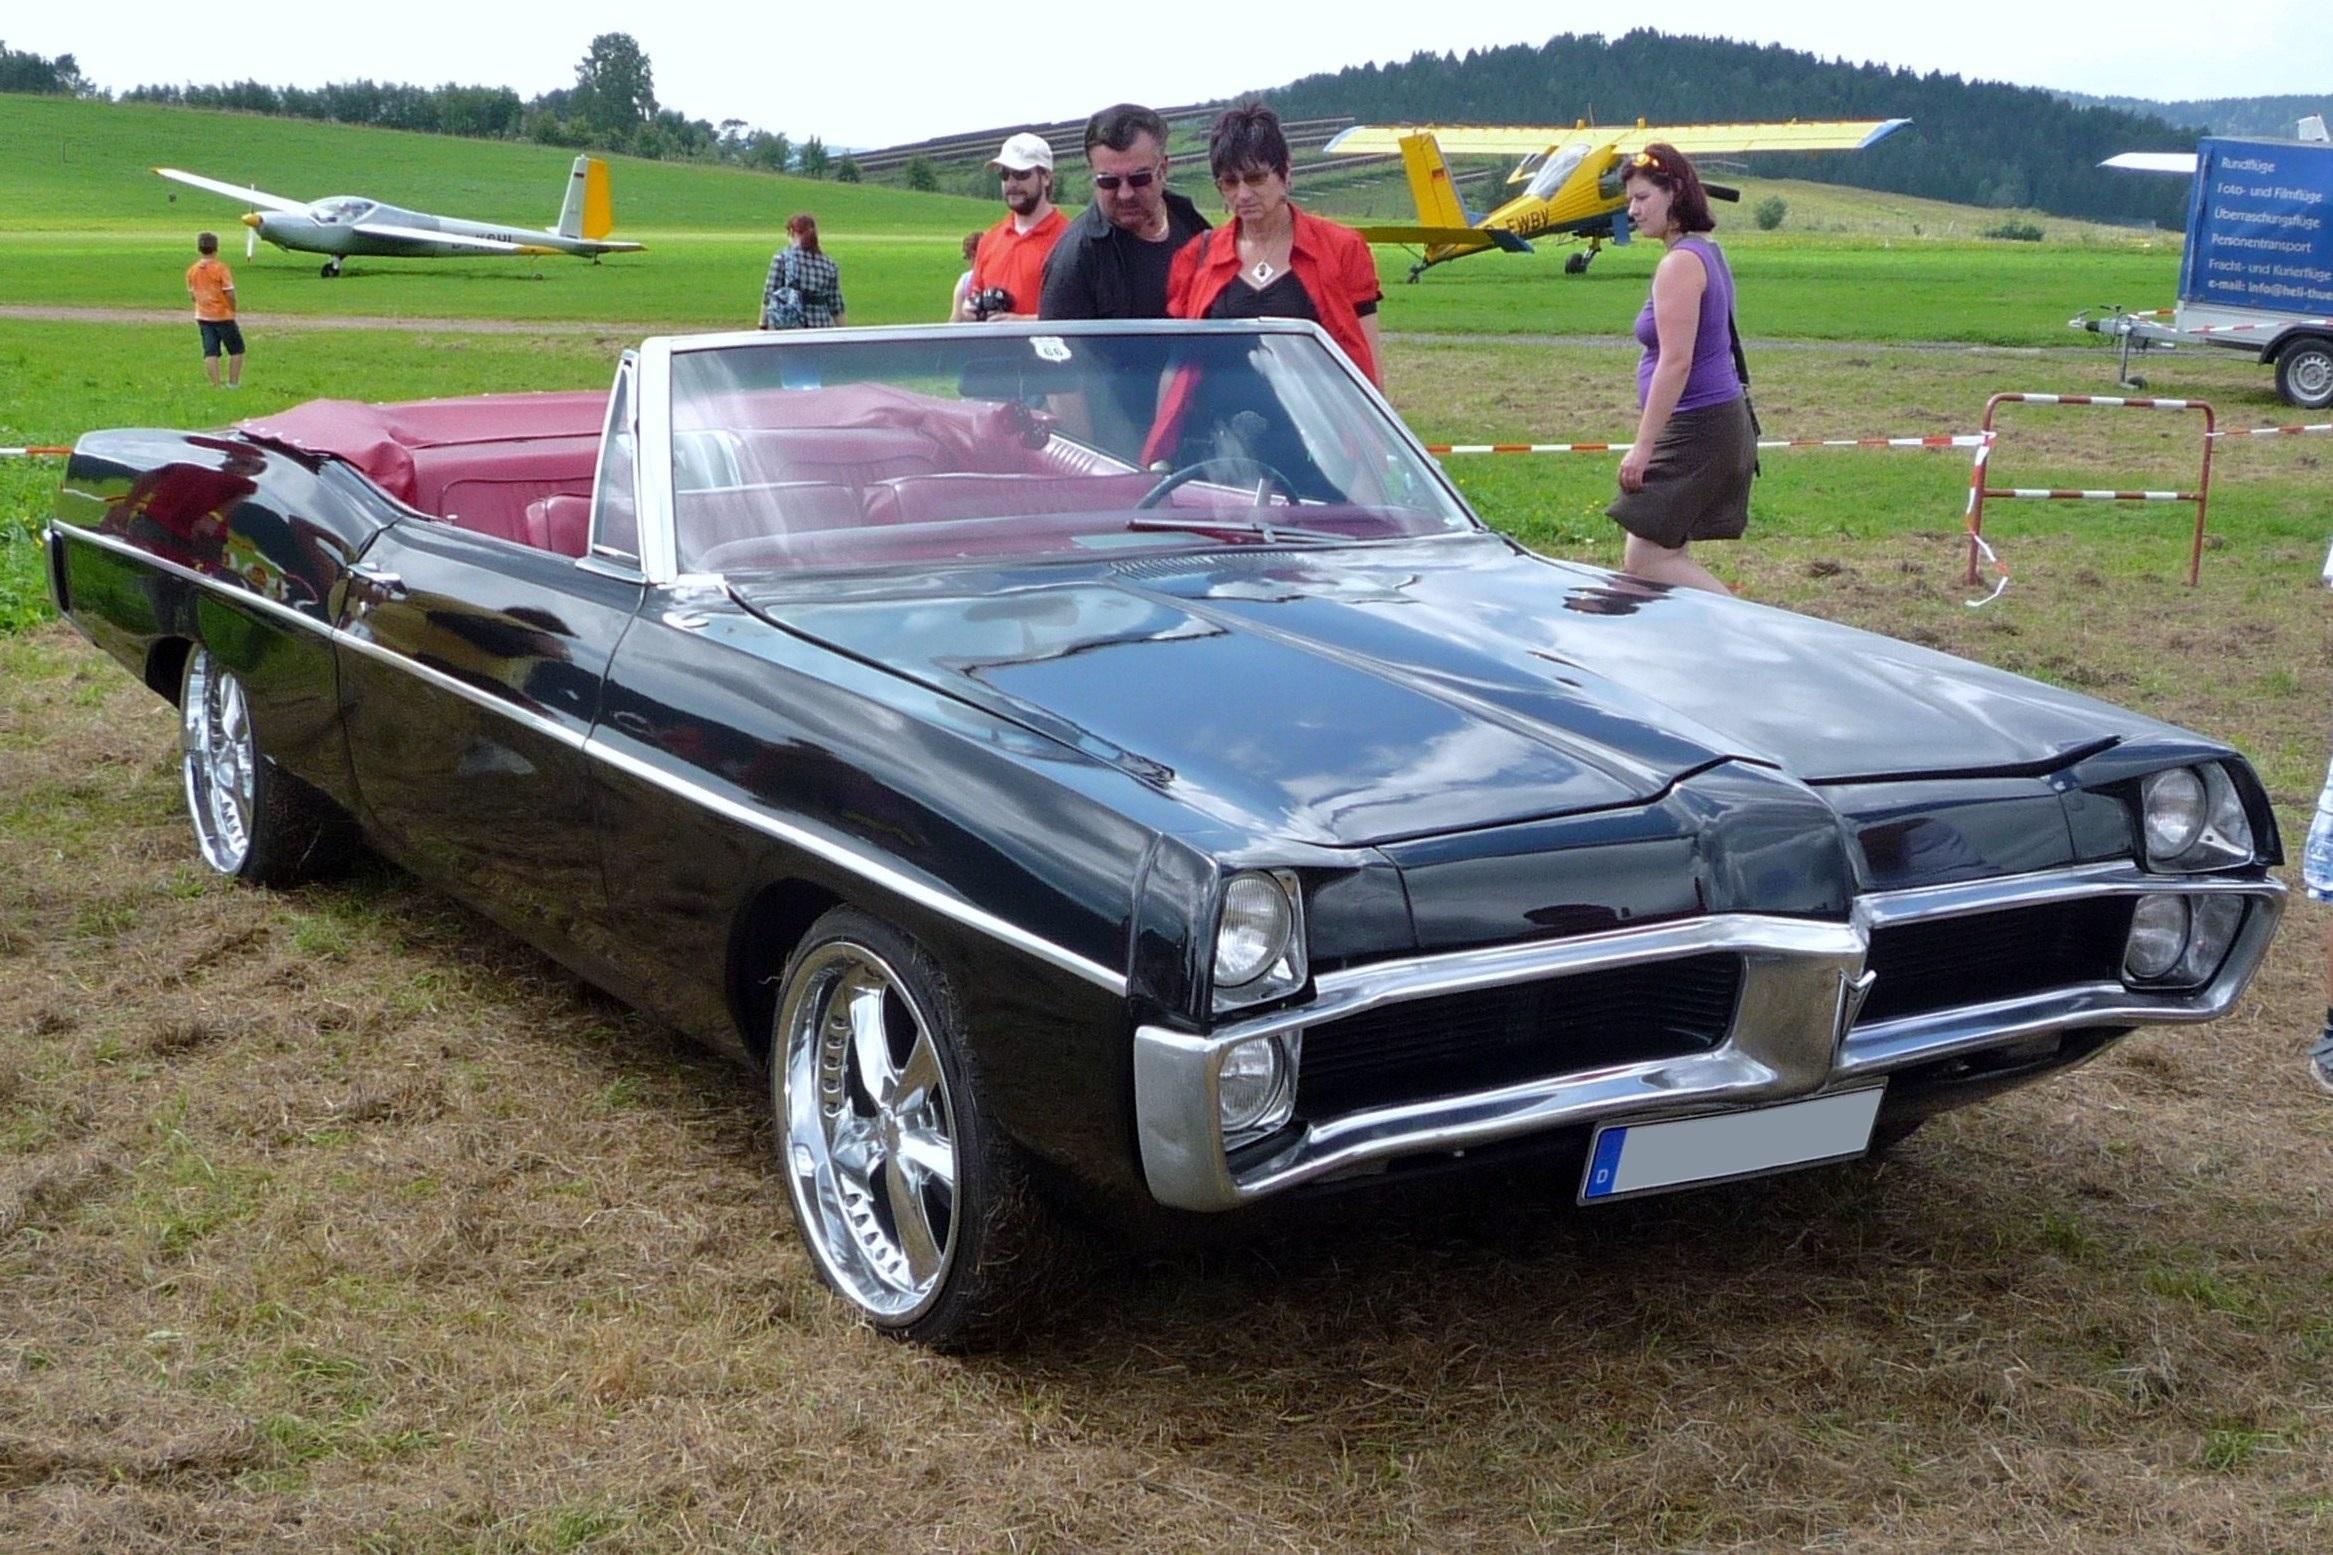 67 Impala For Sale Craigslist | Autos Post